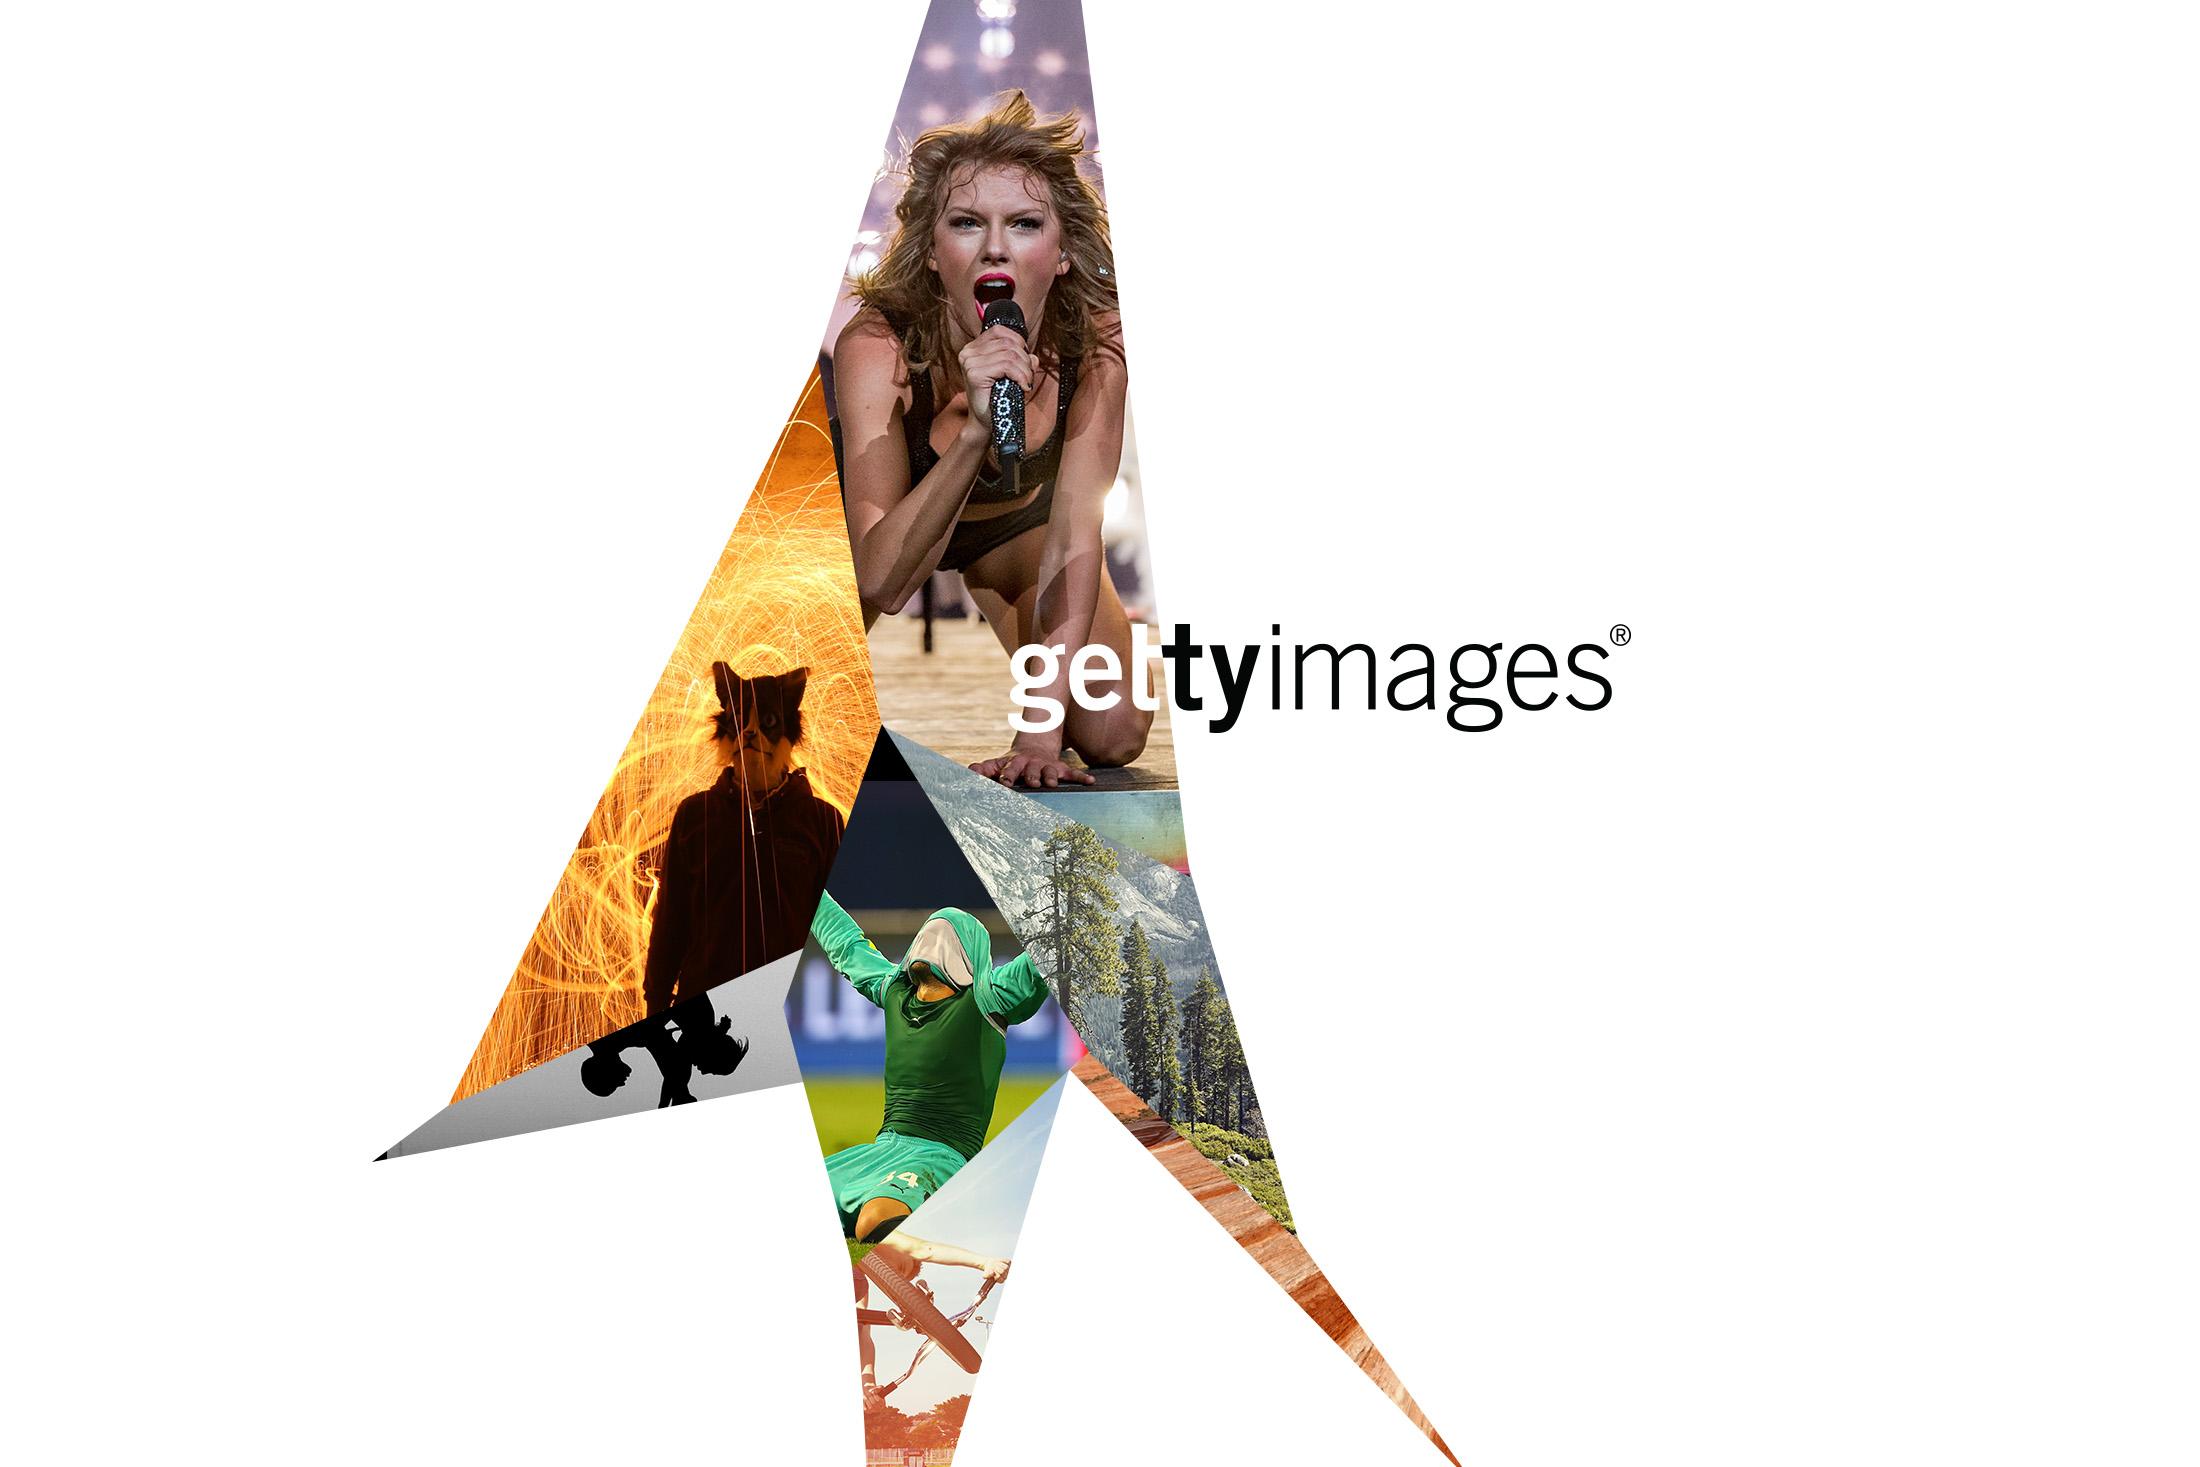 Getty Image Brand Frame